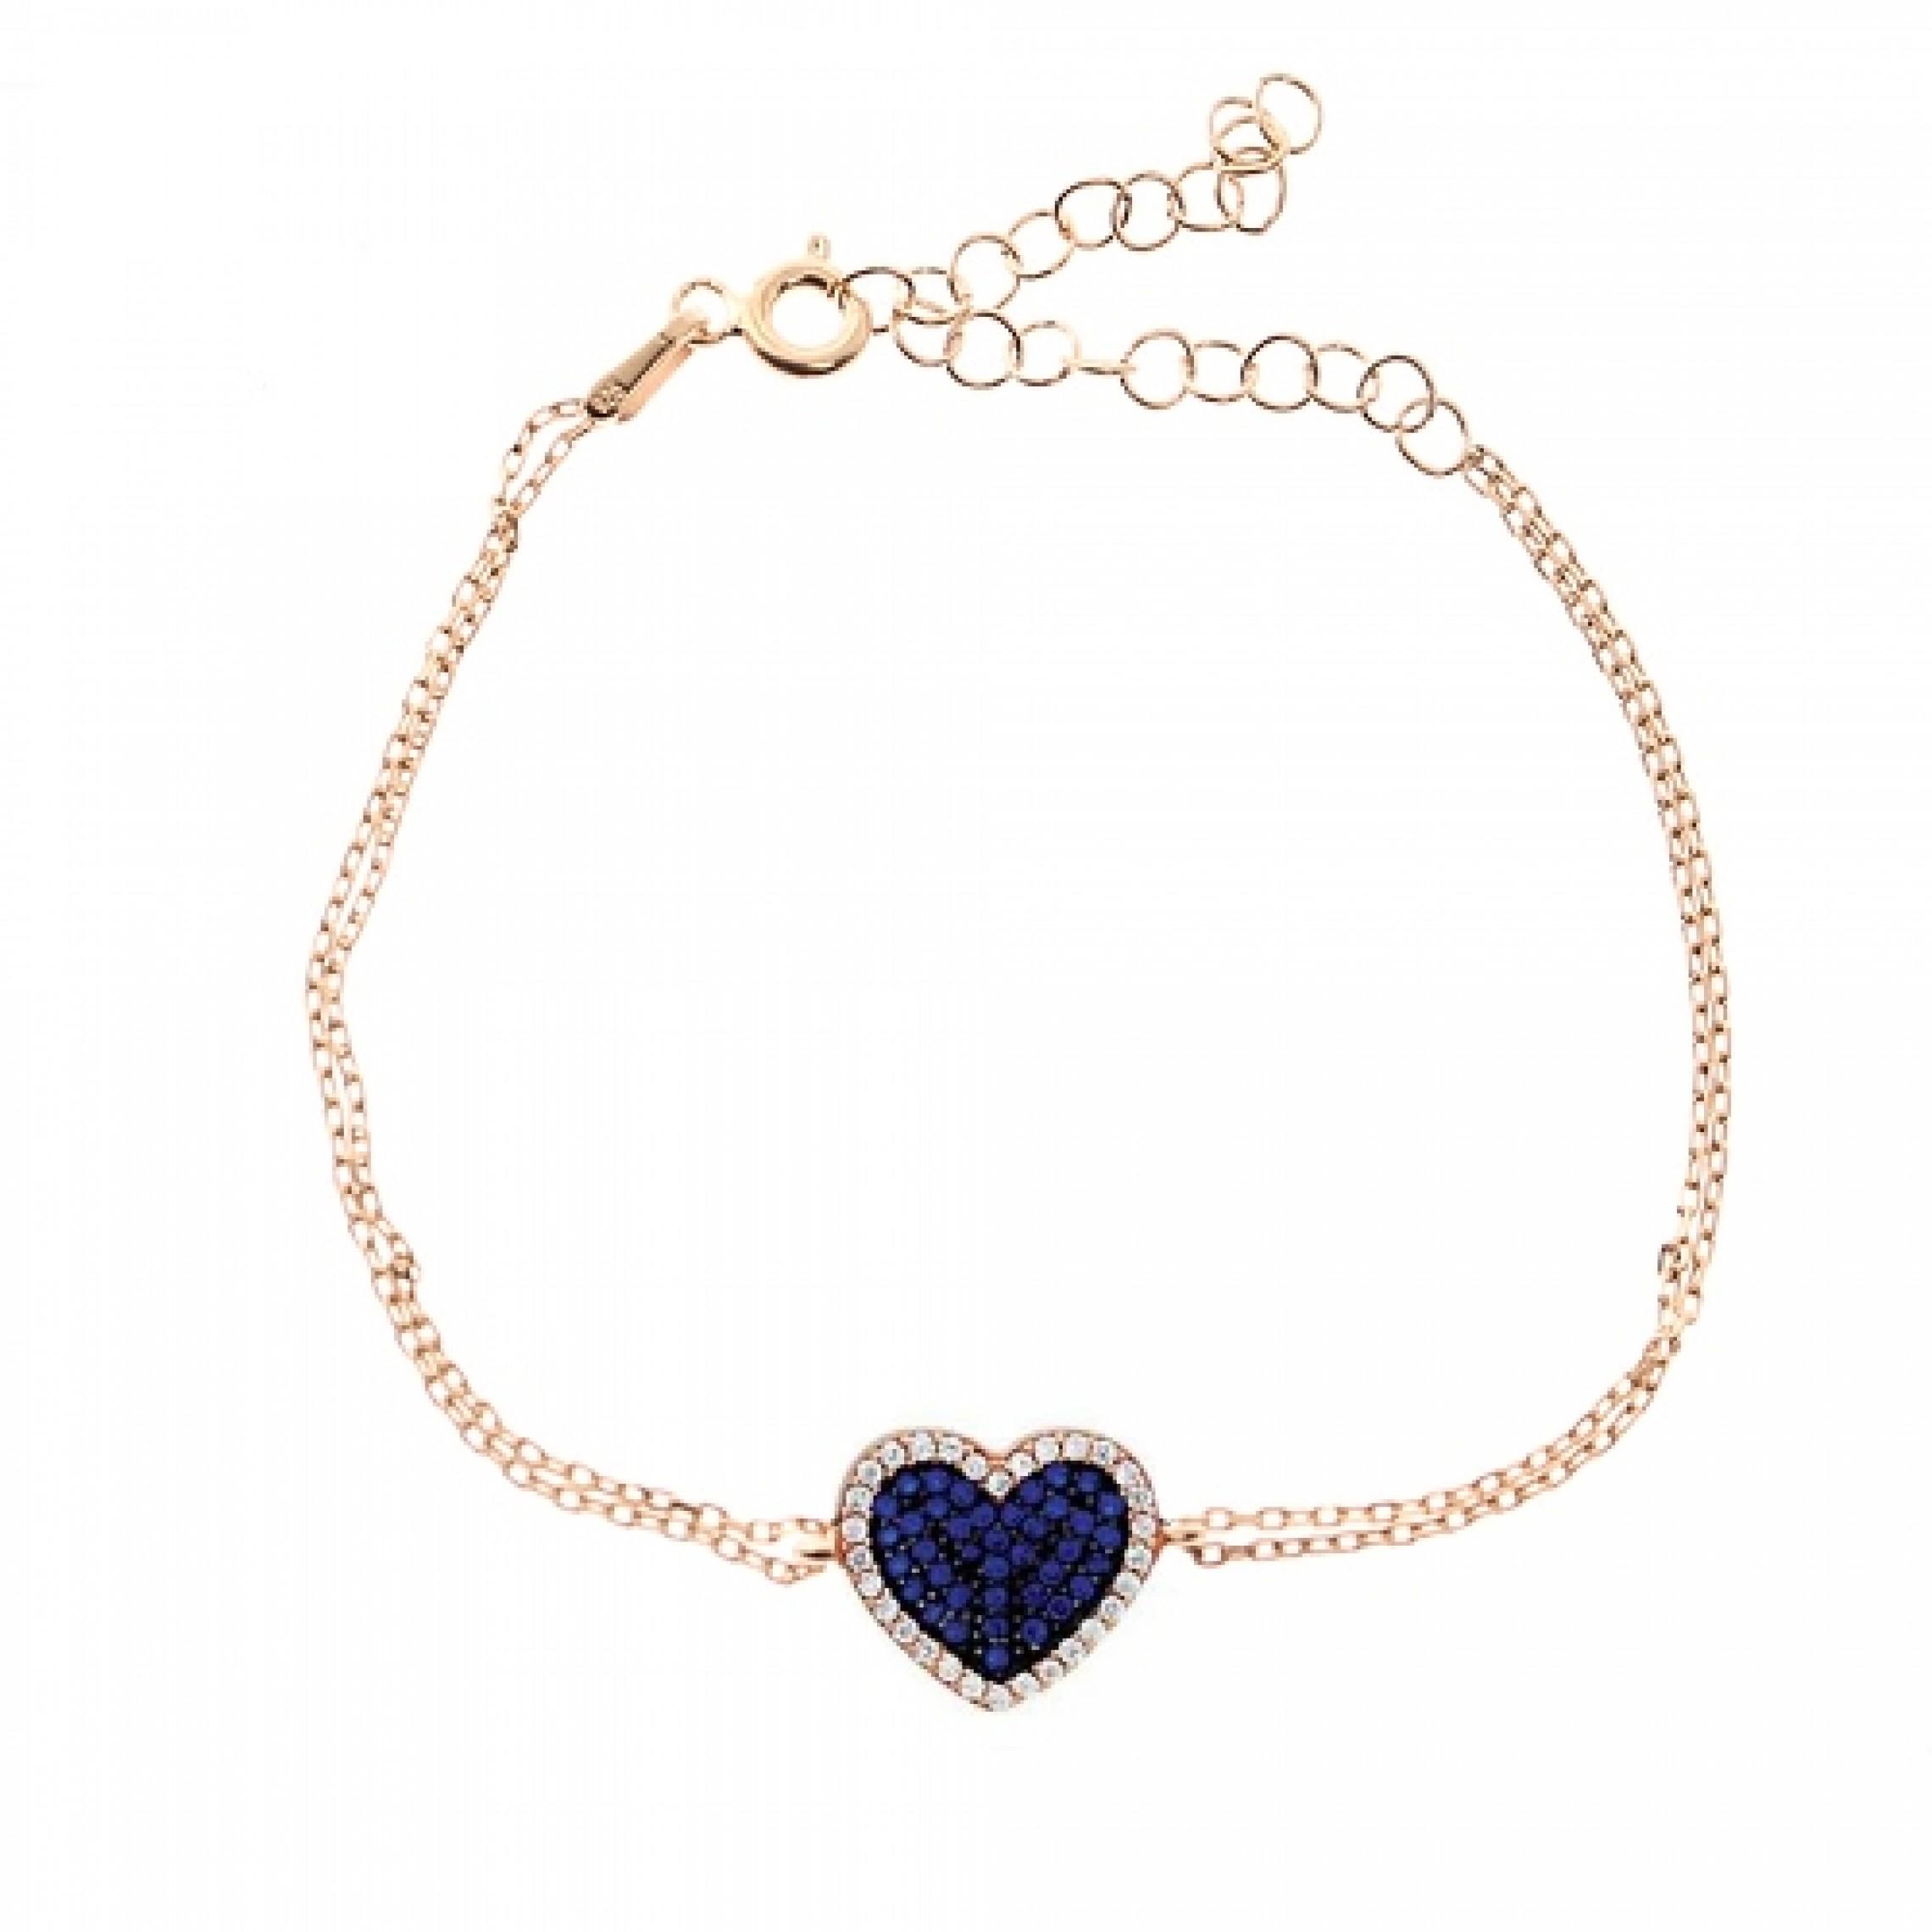 JB-180085 Evil Eye 925 Sterling Silver CZ Bracelet Heart